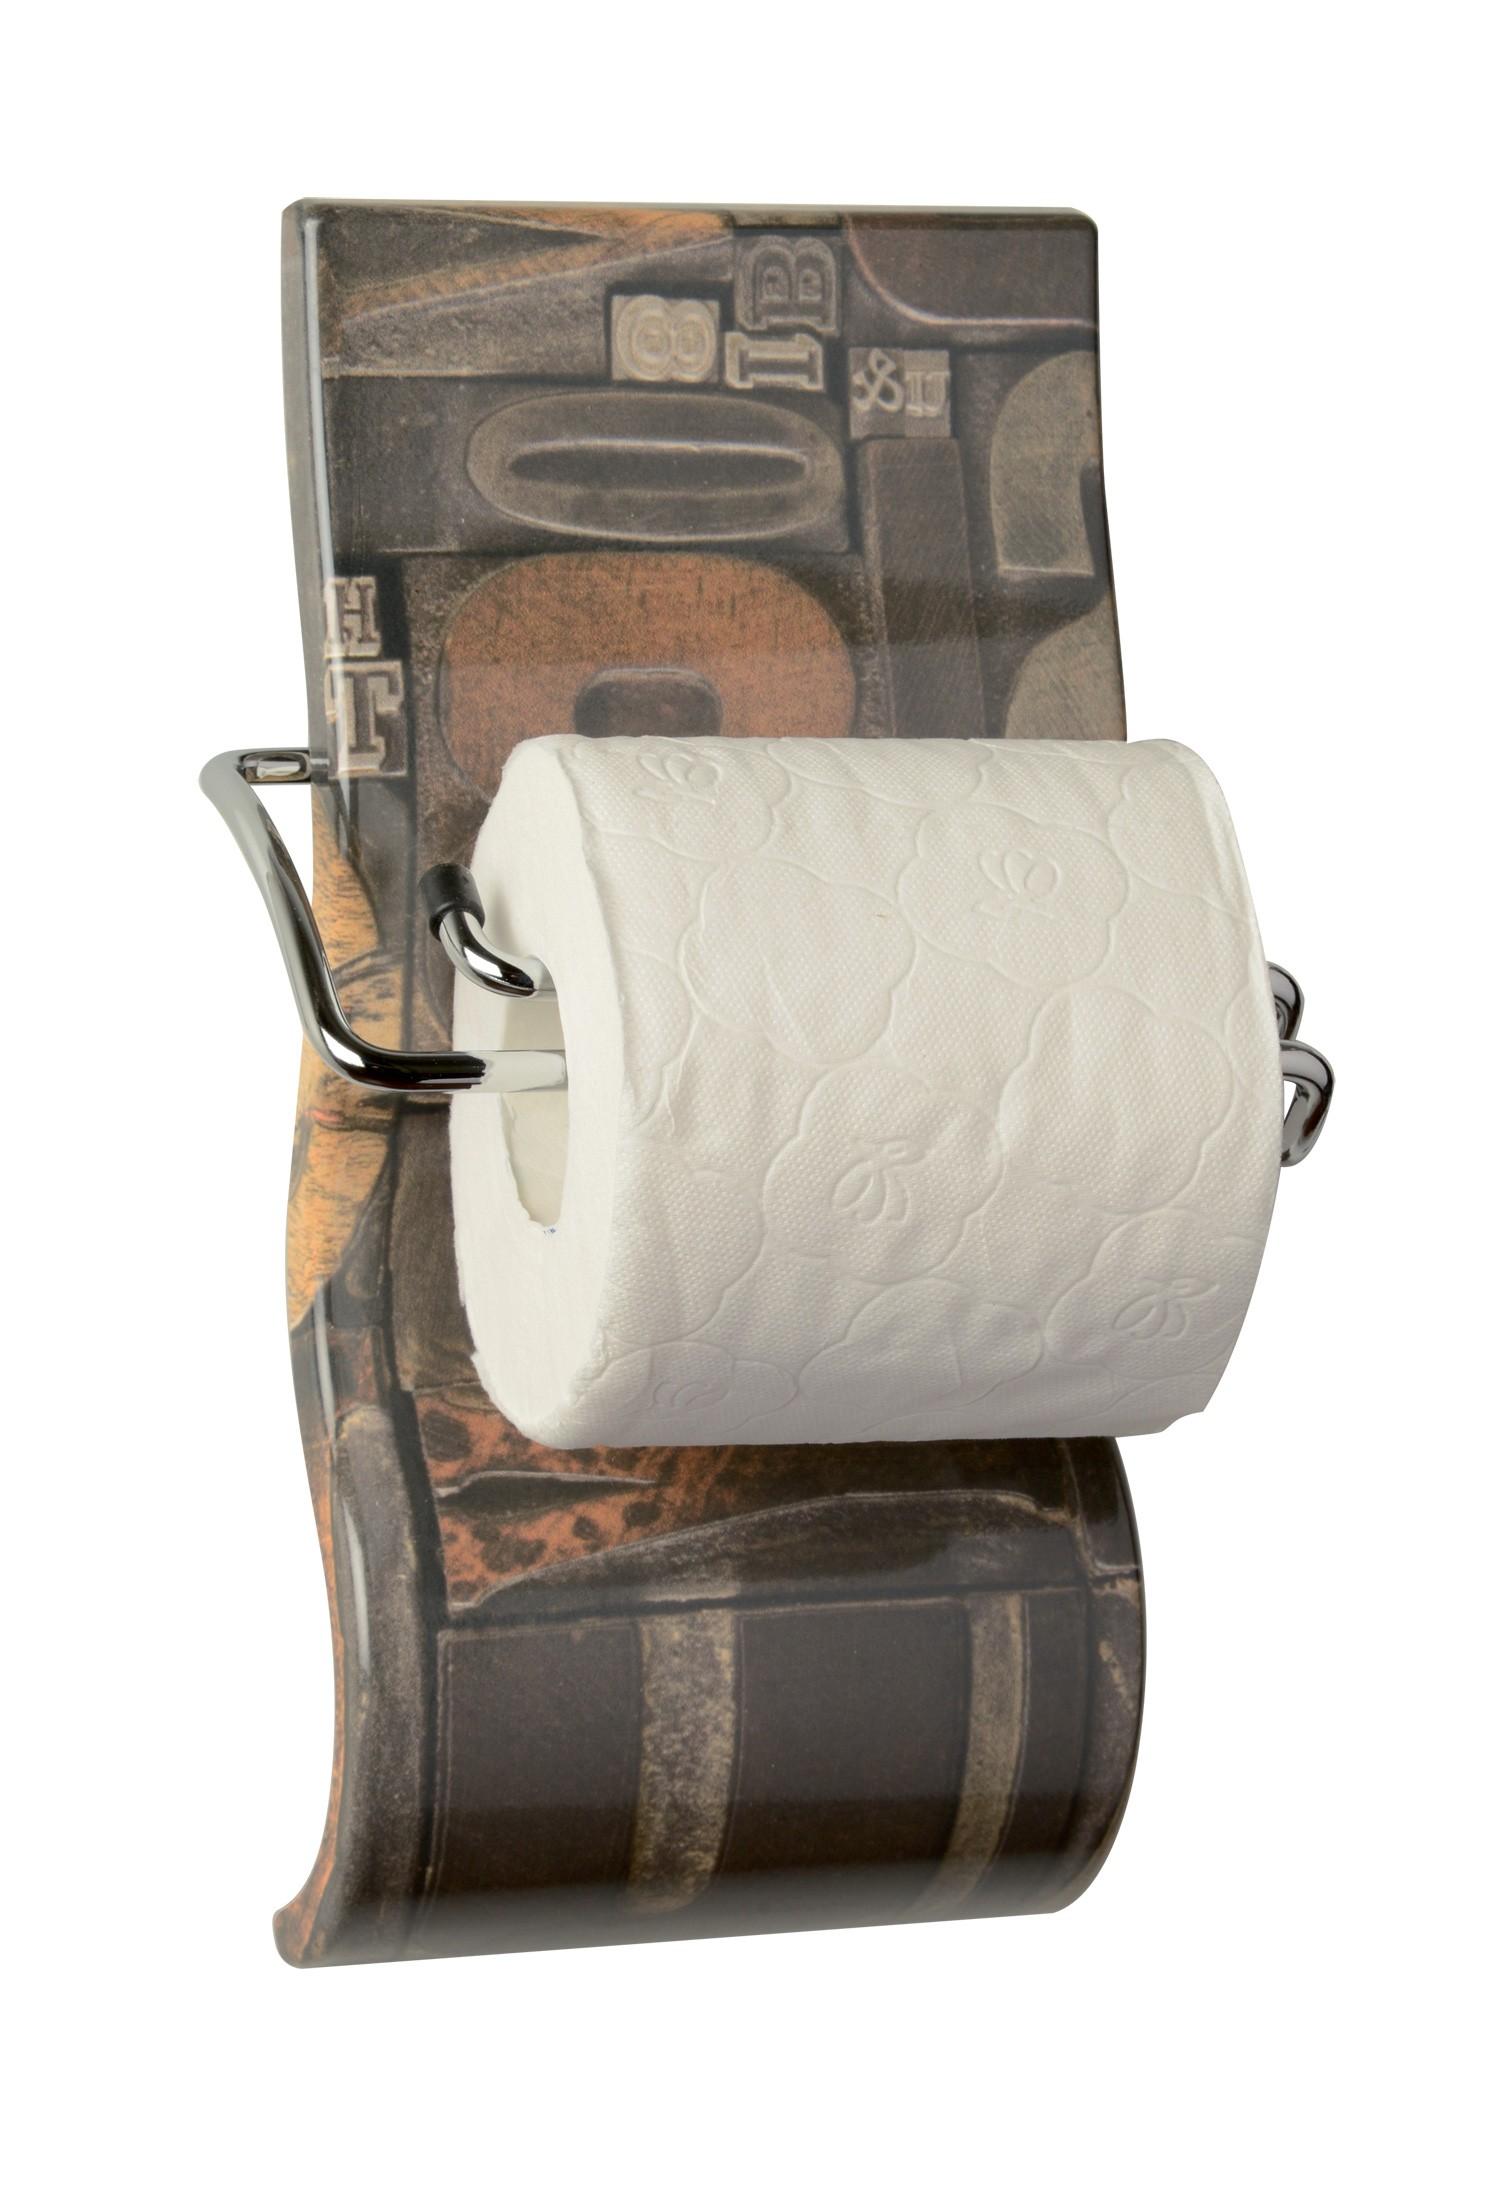 Porte Papier Wc Caracteres Olfa Expert En Toilettes